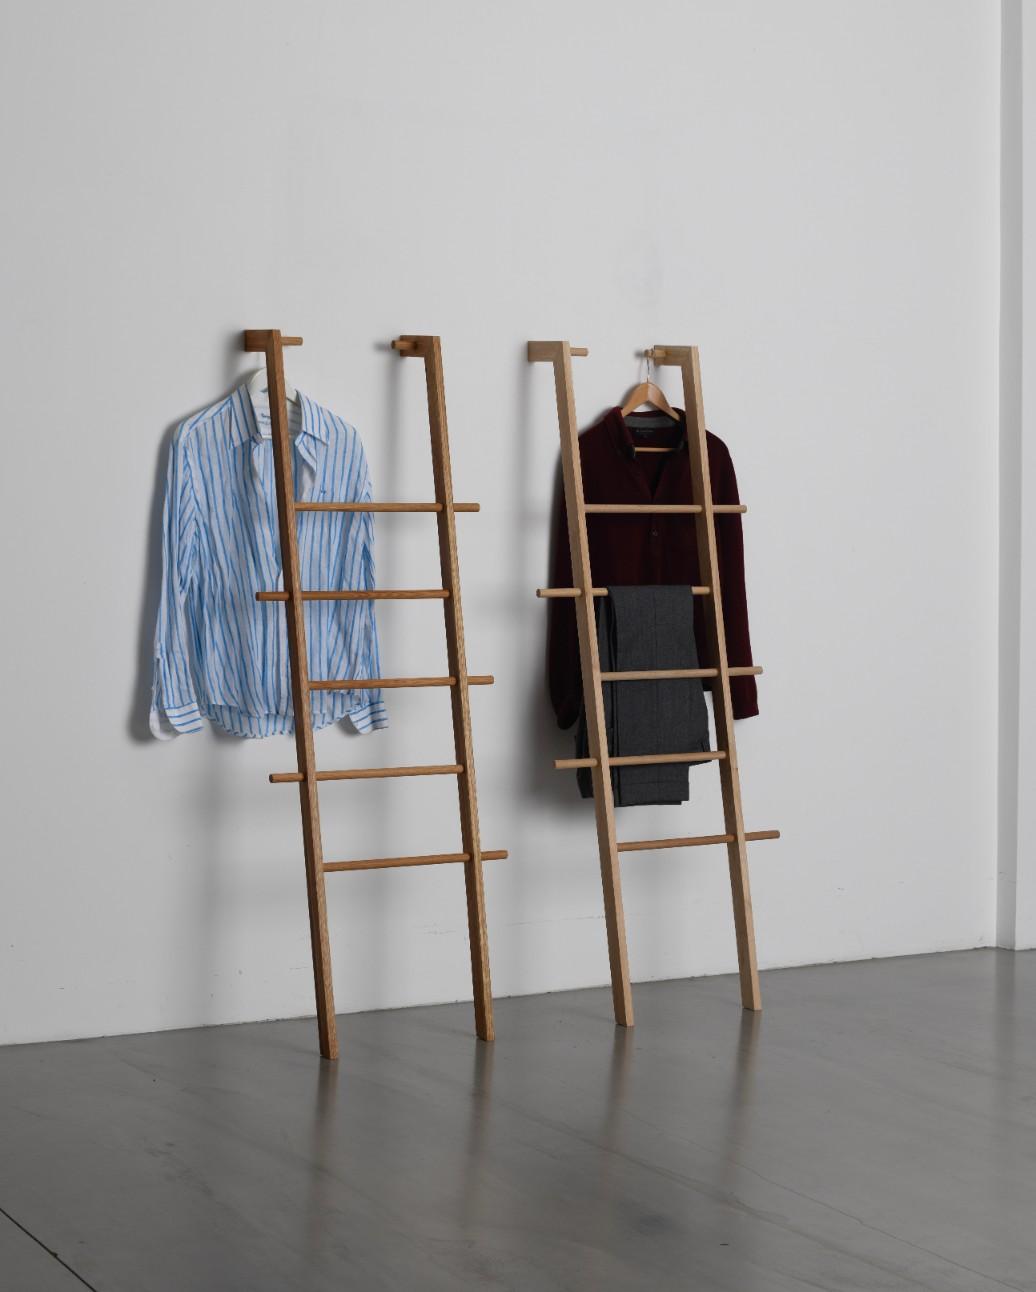 Clothes ladder bedroom Kleiderleiter schlafzimmer, wider than a normal one by Tidyboy